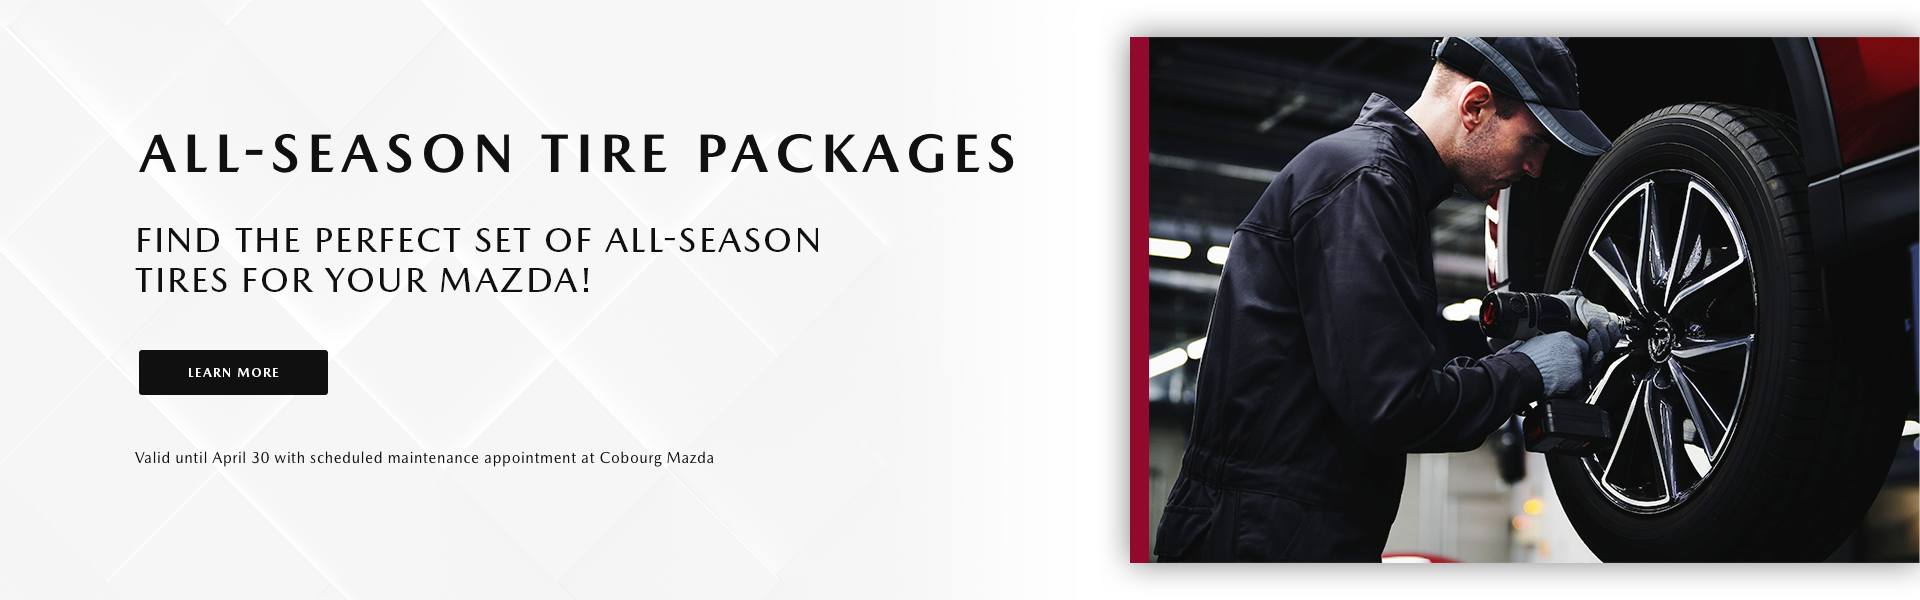 All Season Tire Package